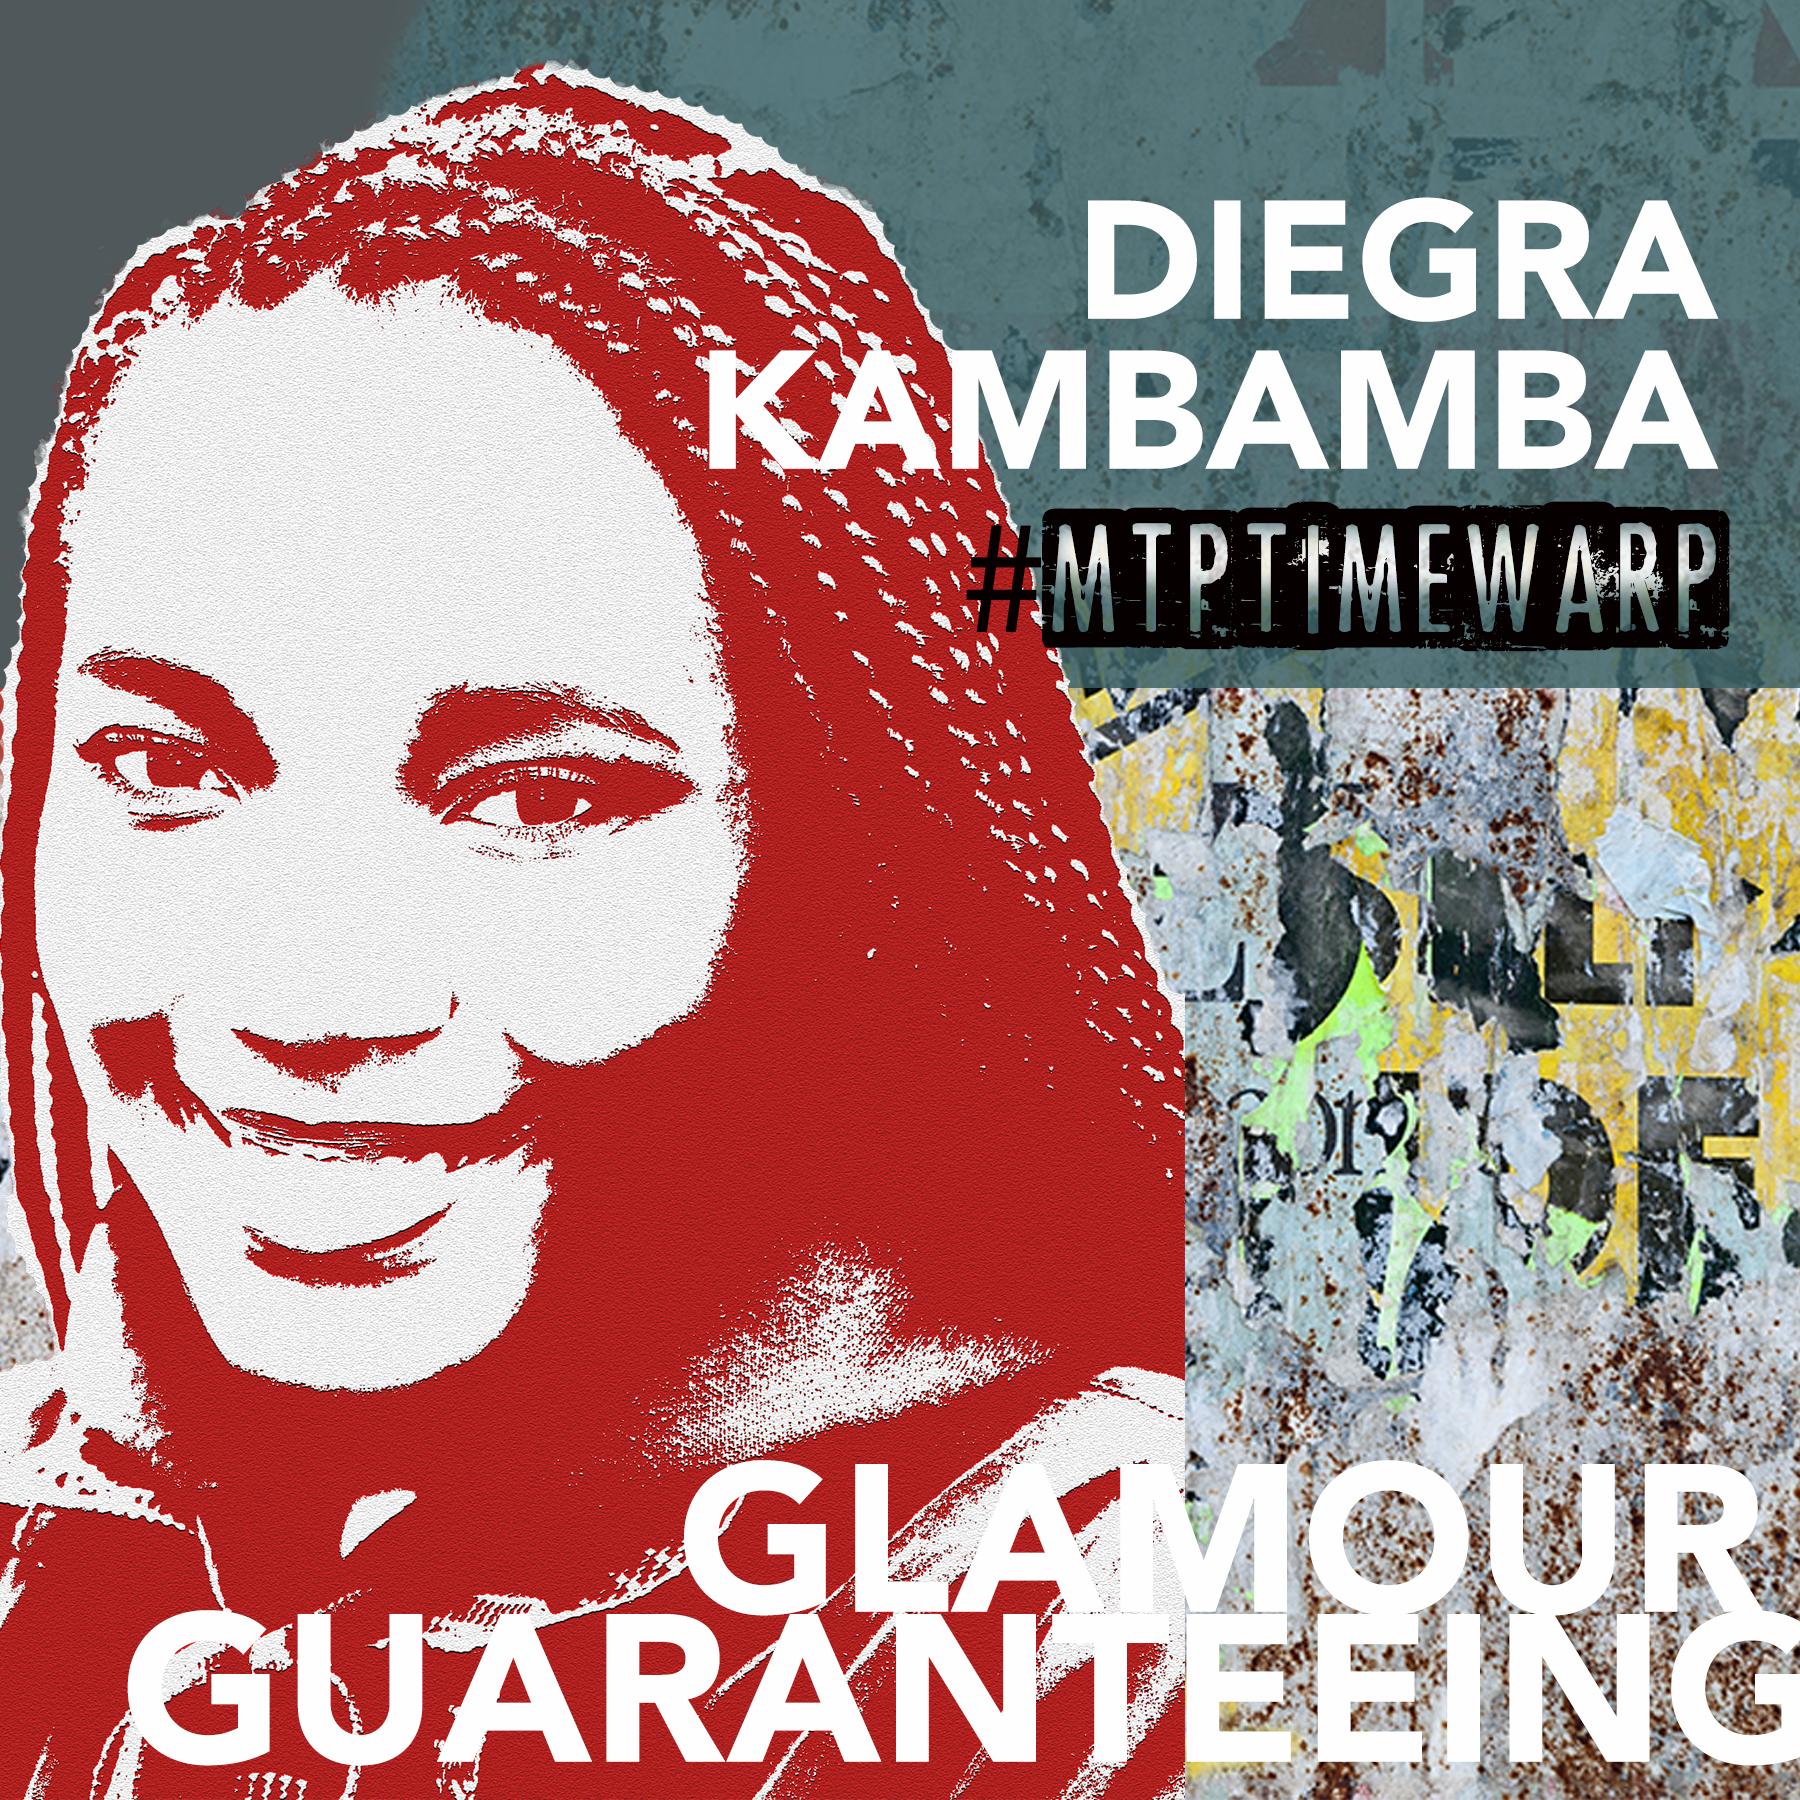 Diegra Kambamba Headshot.png